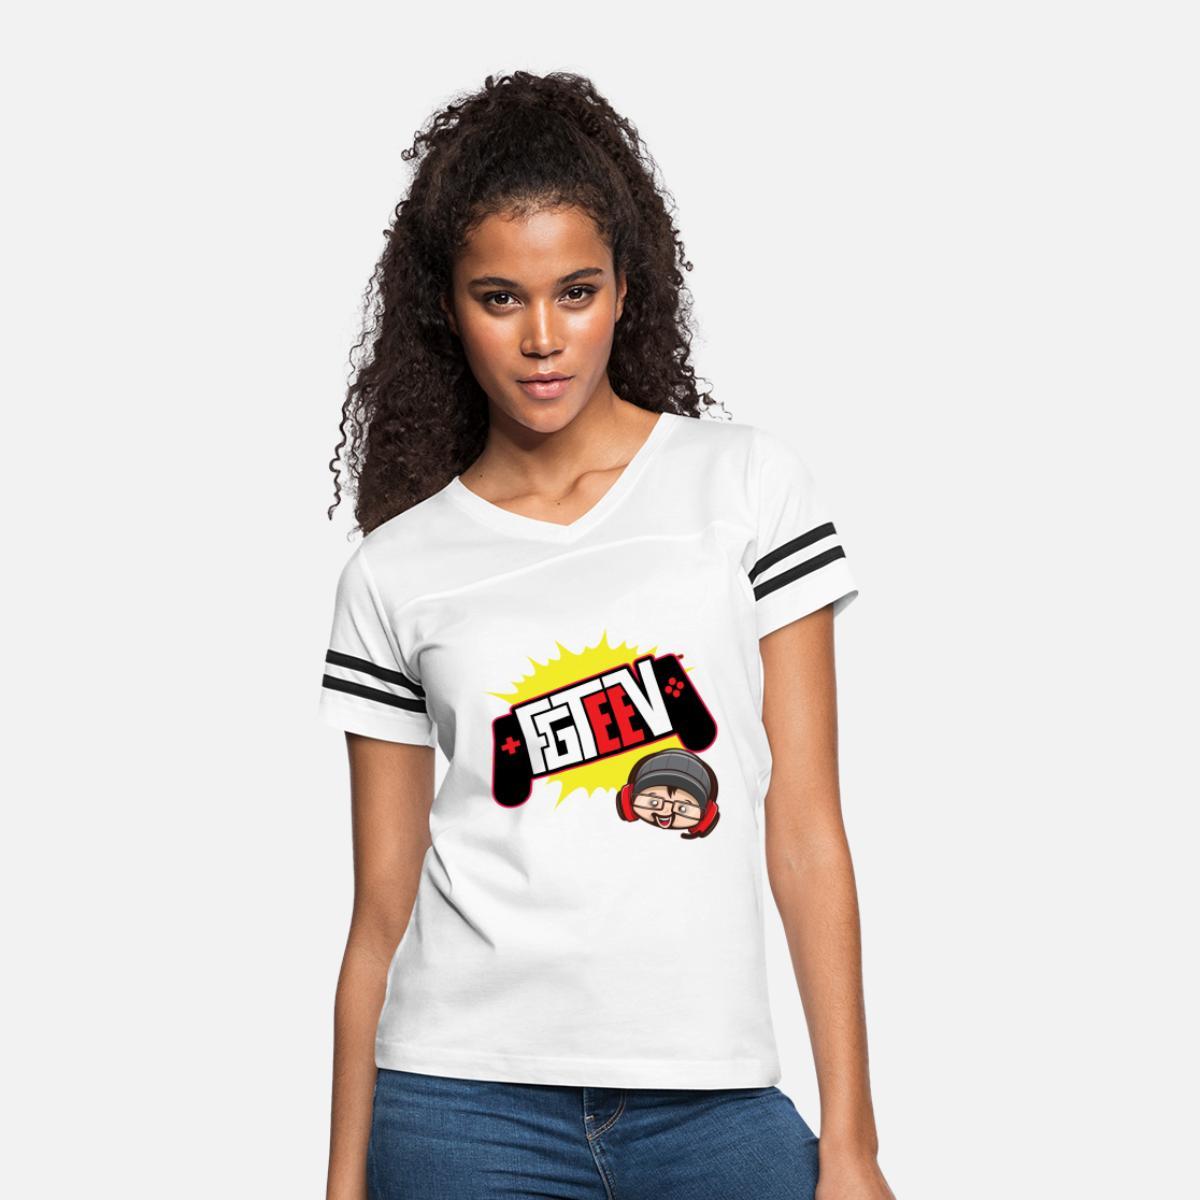 FGTeeV 2019 Logo Kids/' Crewneck Sweatshirt by Spreadshirt™